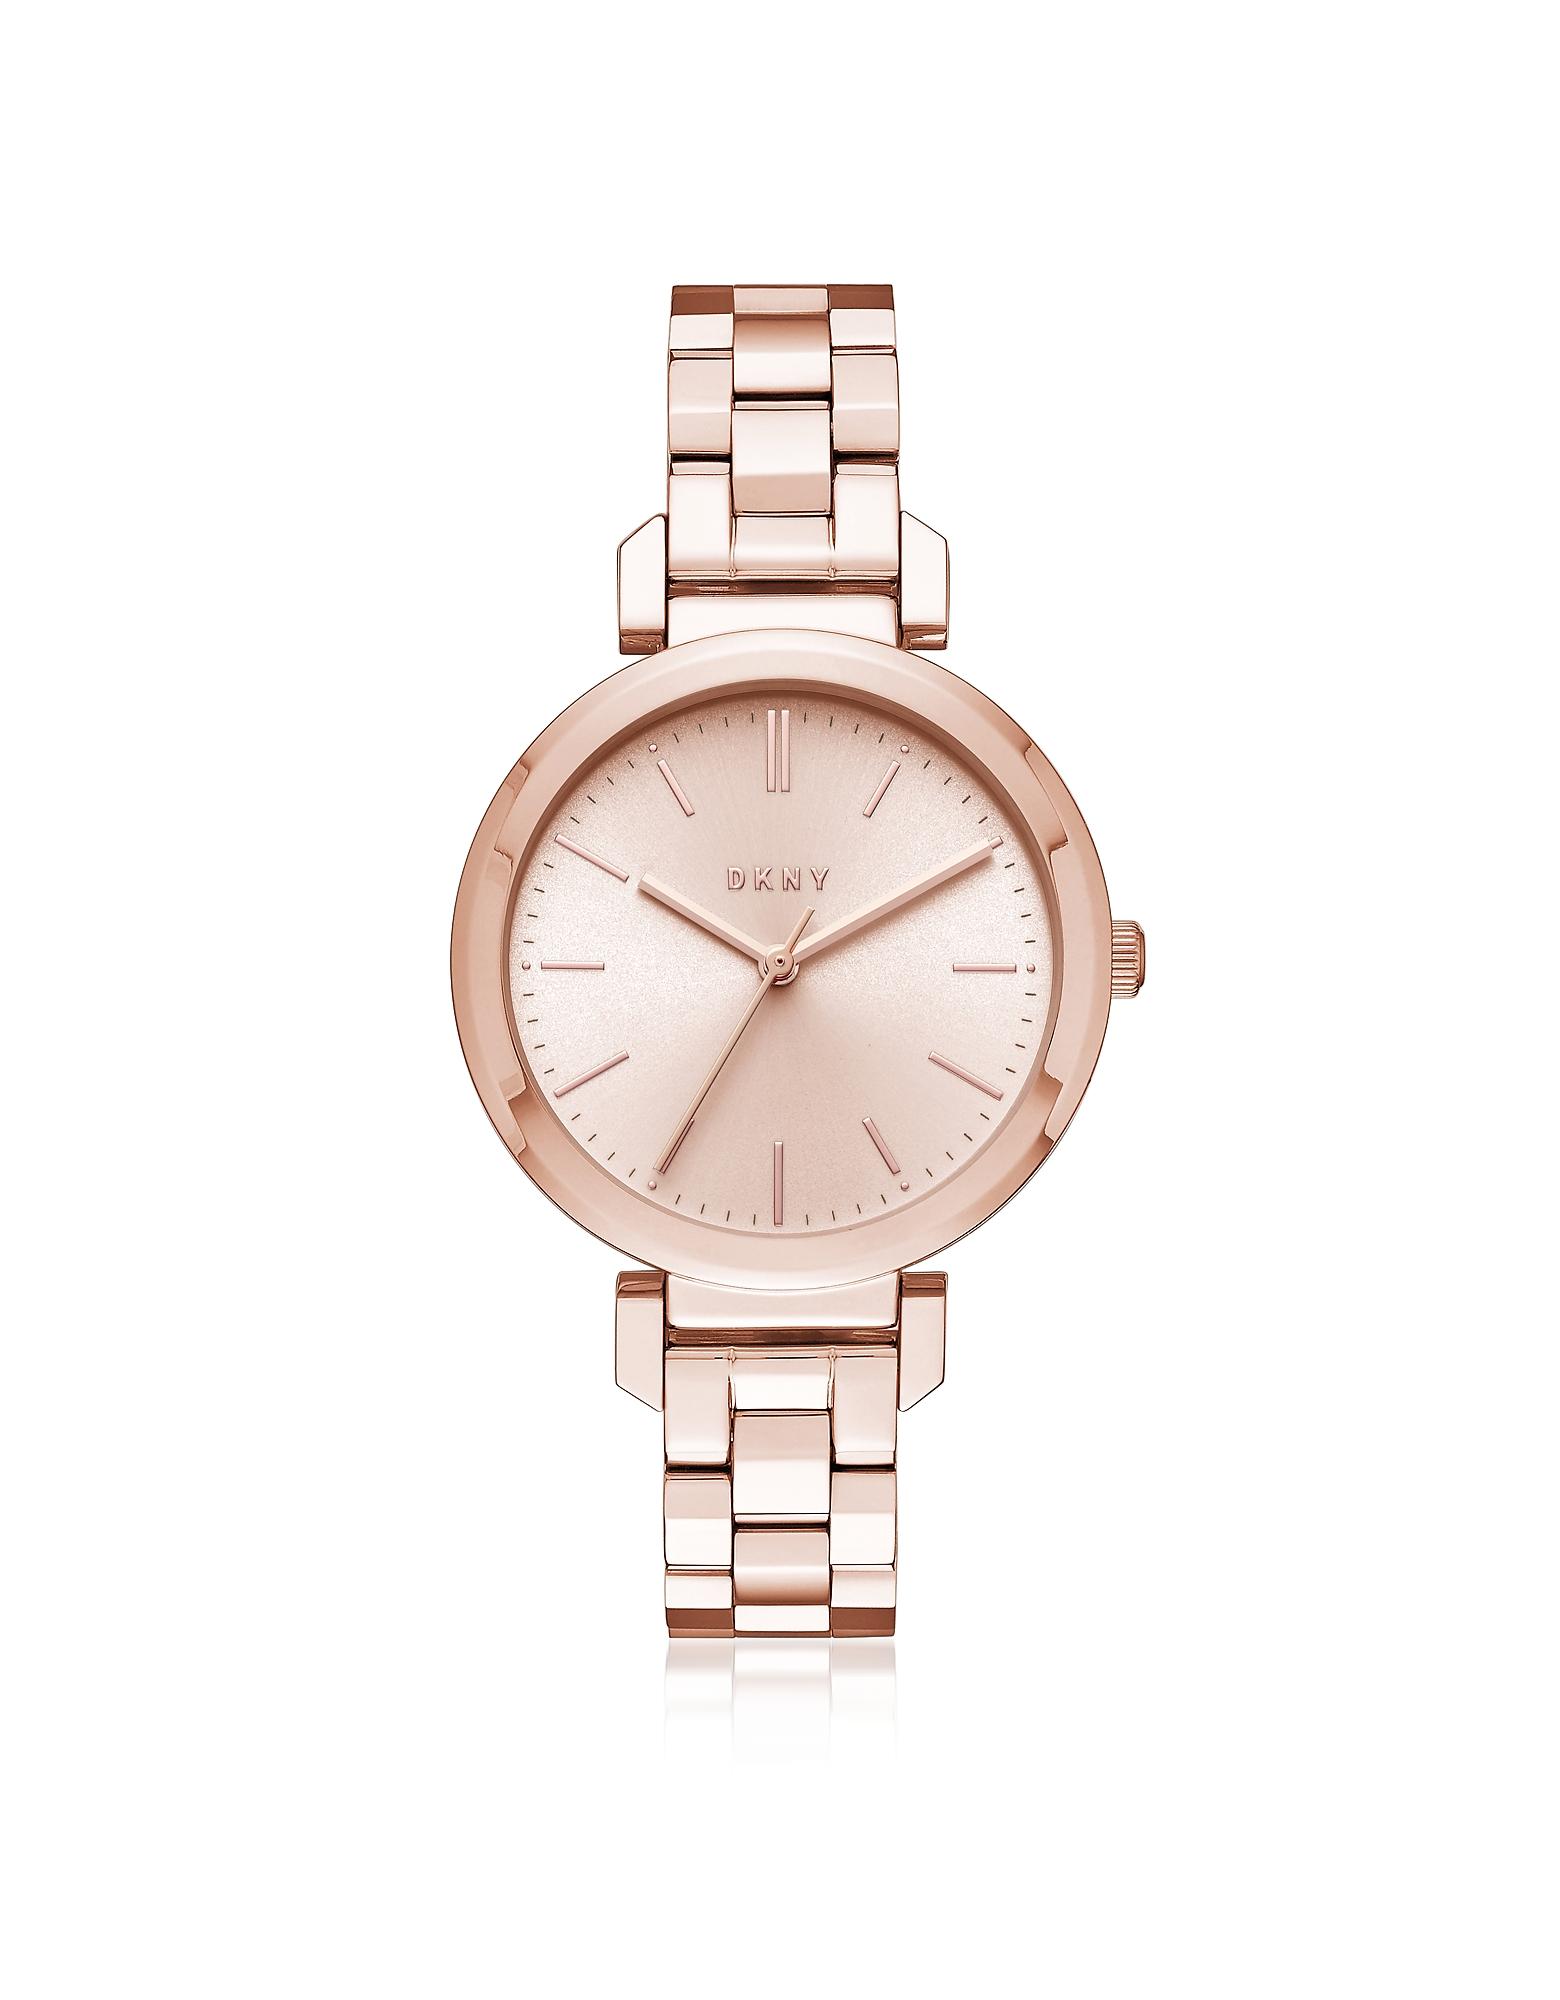 DKNY Women's Watches, Ellington Rose Gold Tone Women's Watch